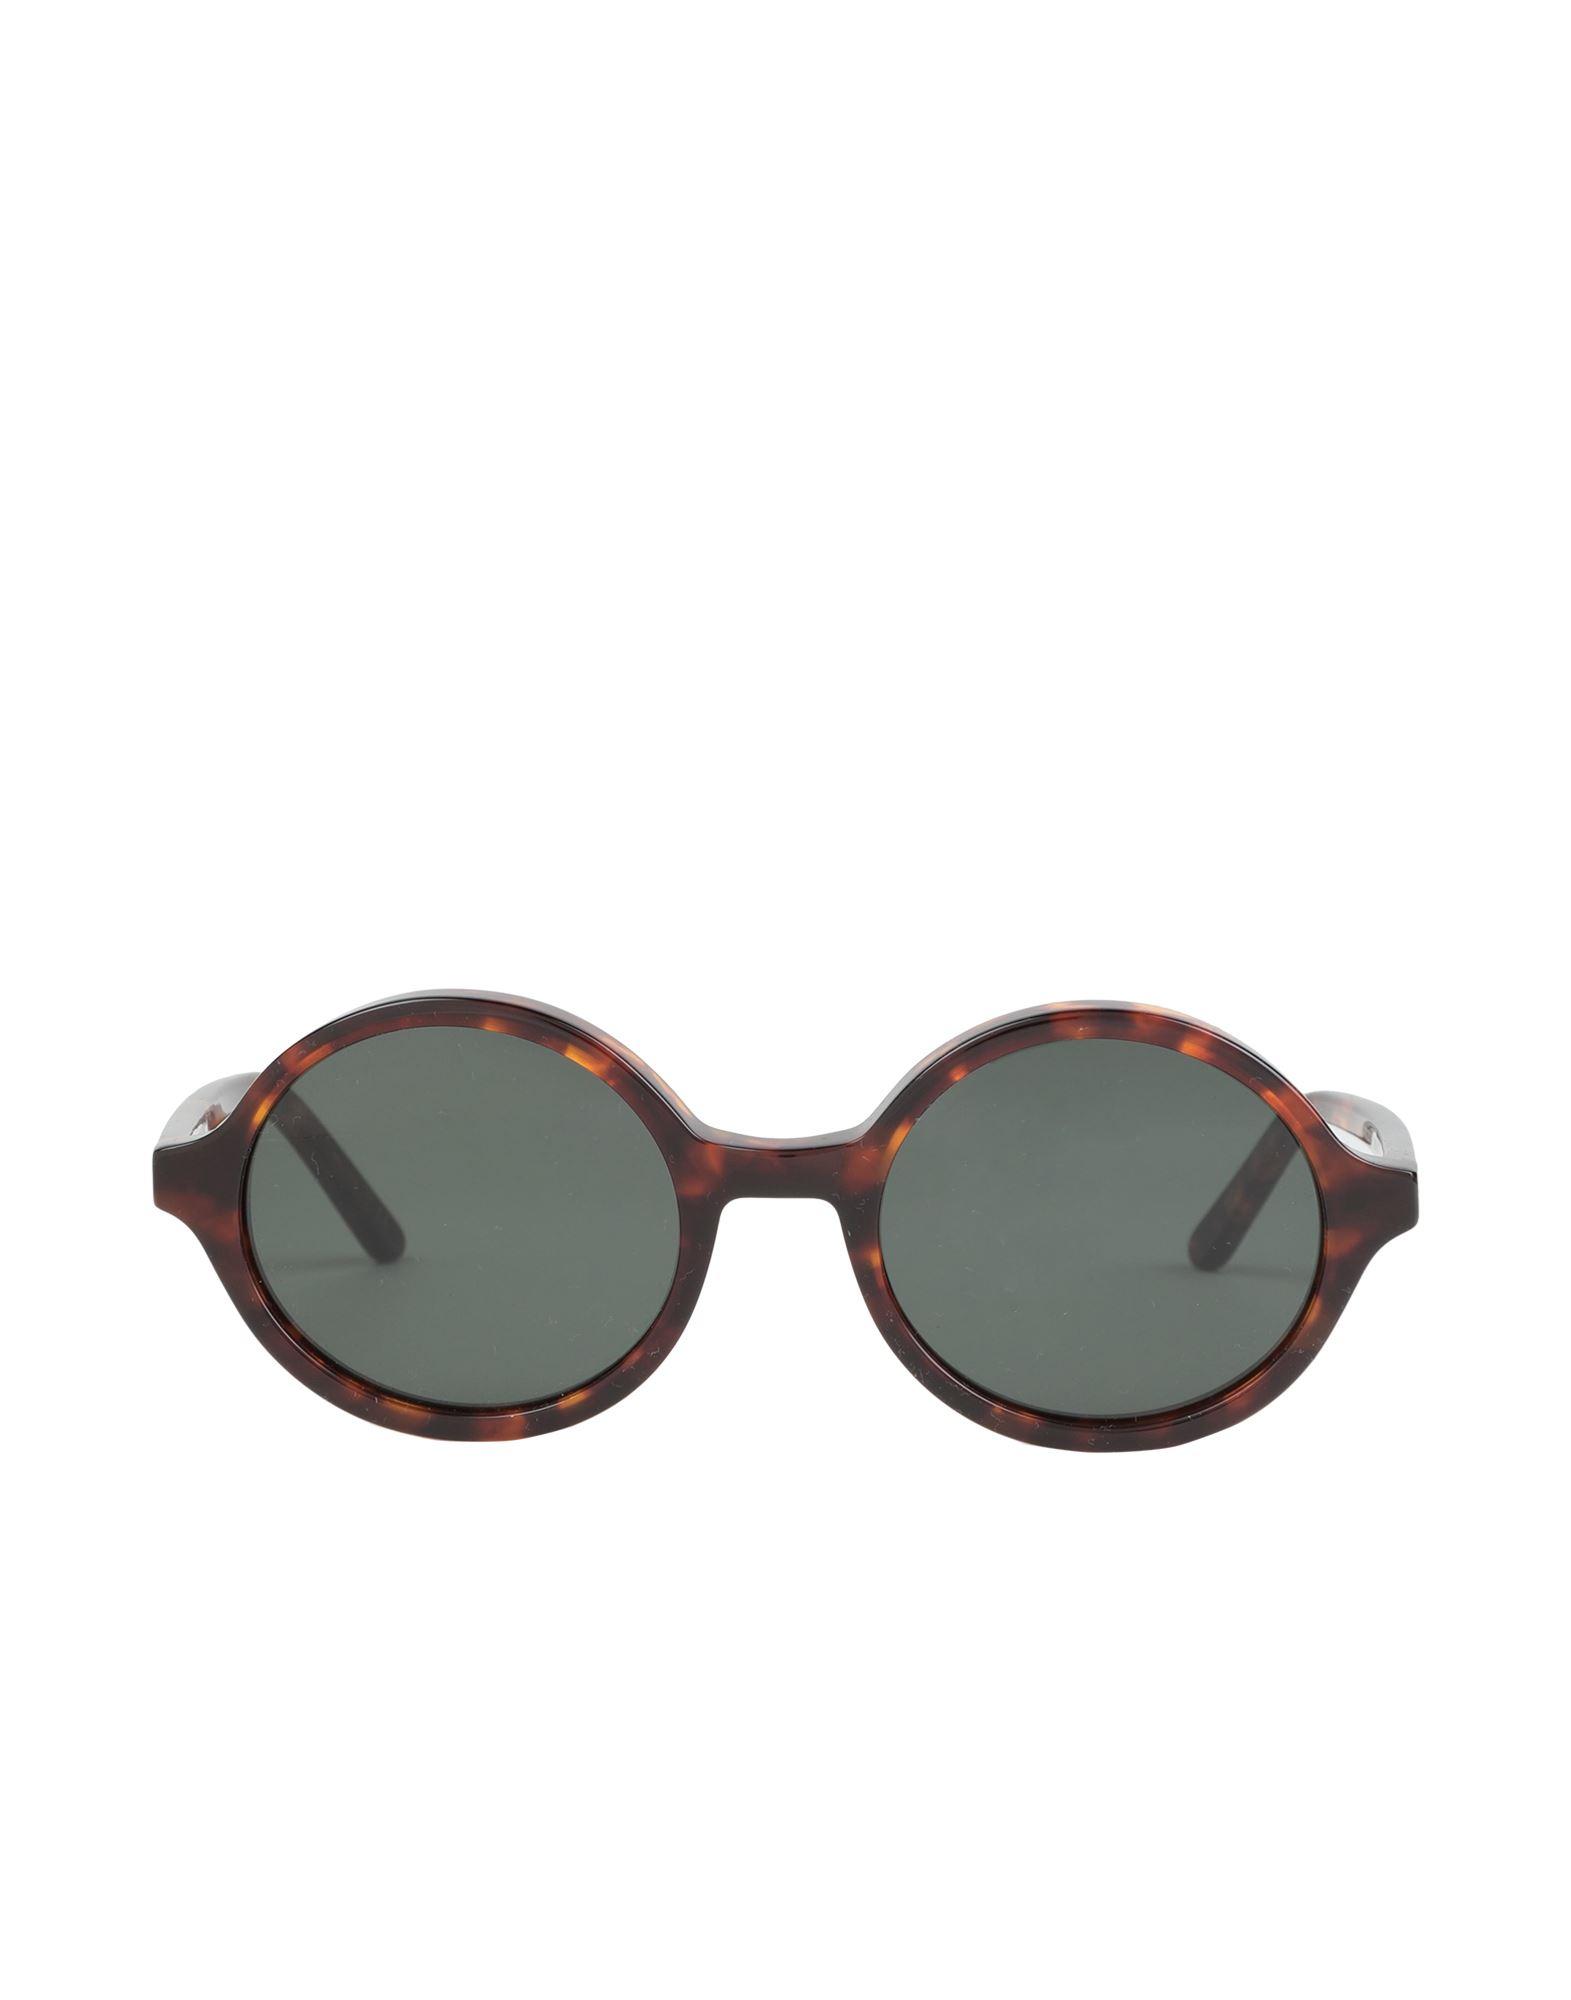 HAN KJØBENHAVN Sunglasses - Item 46737542